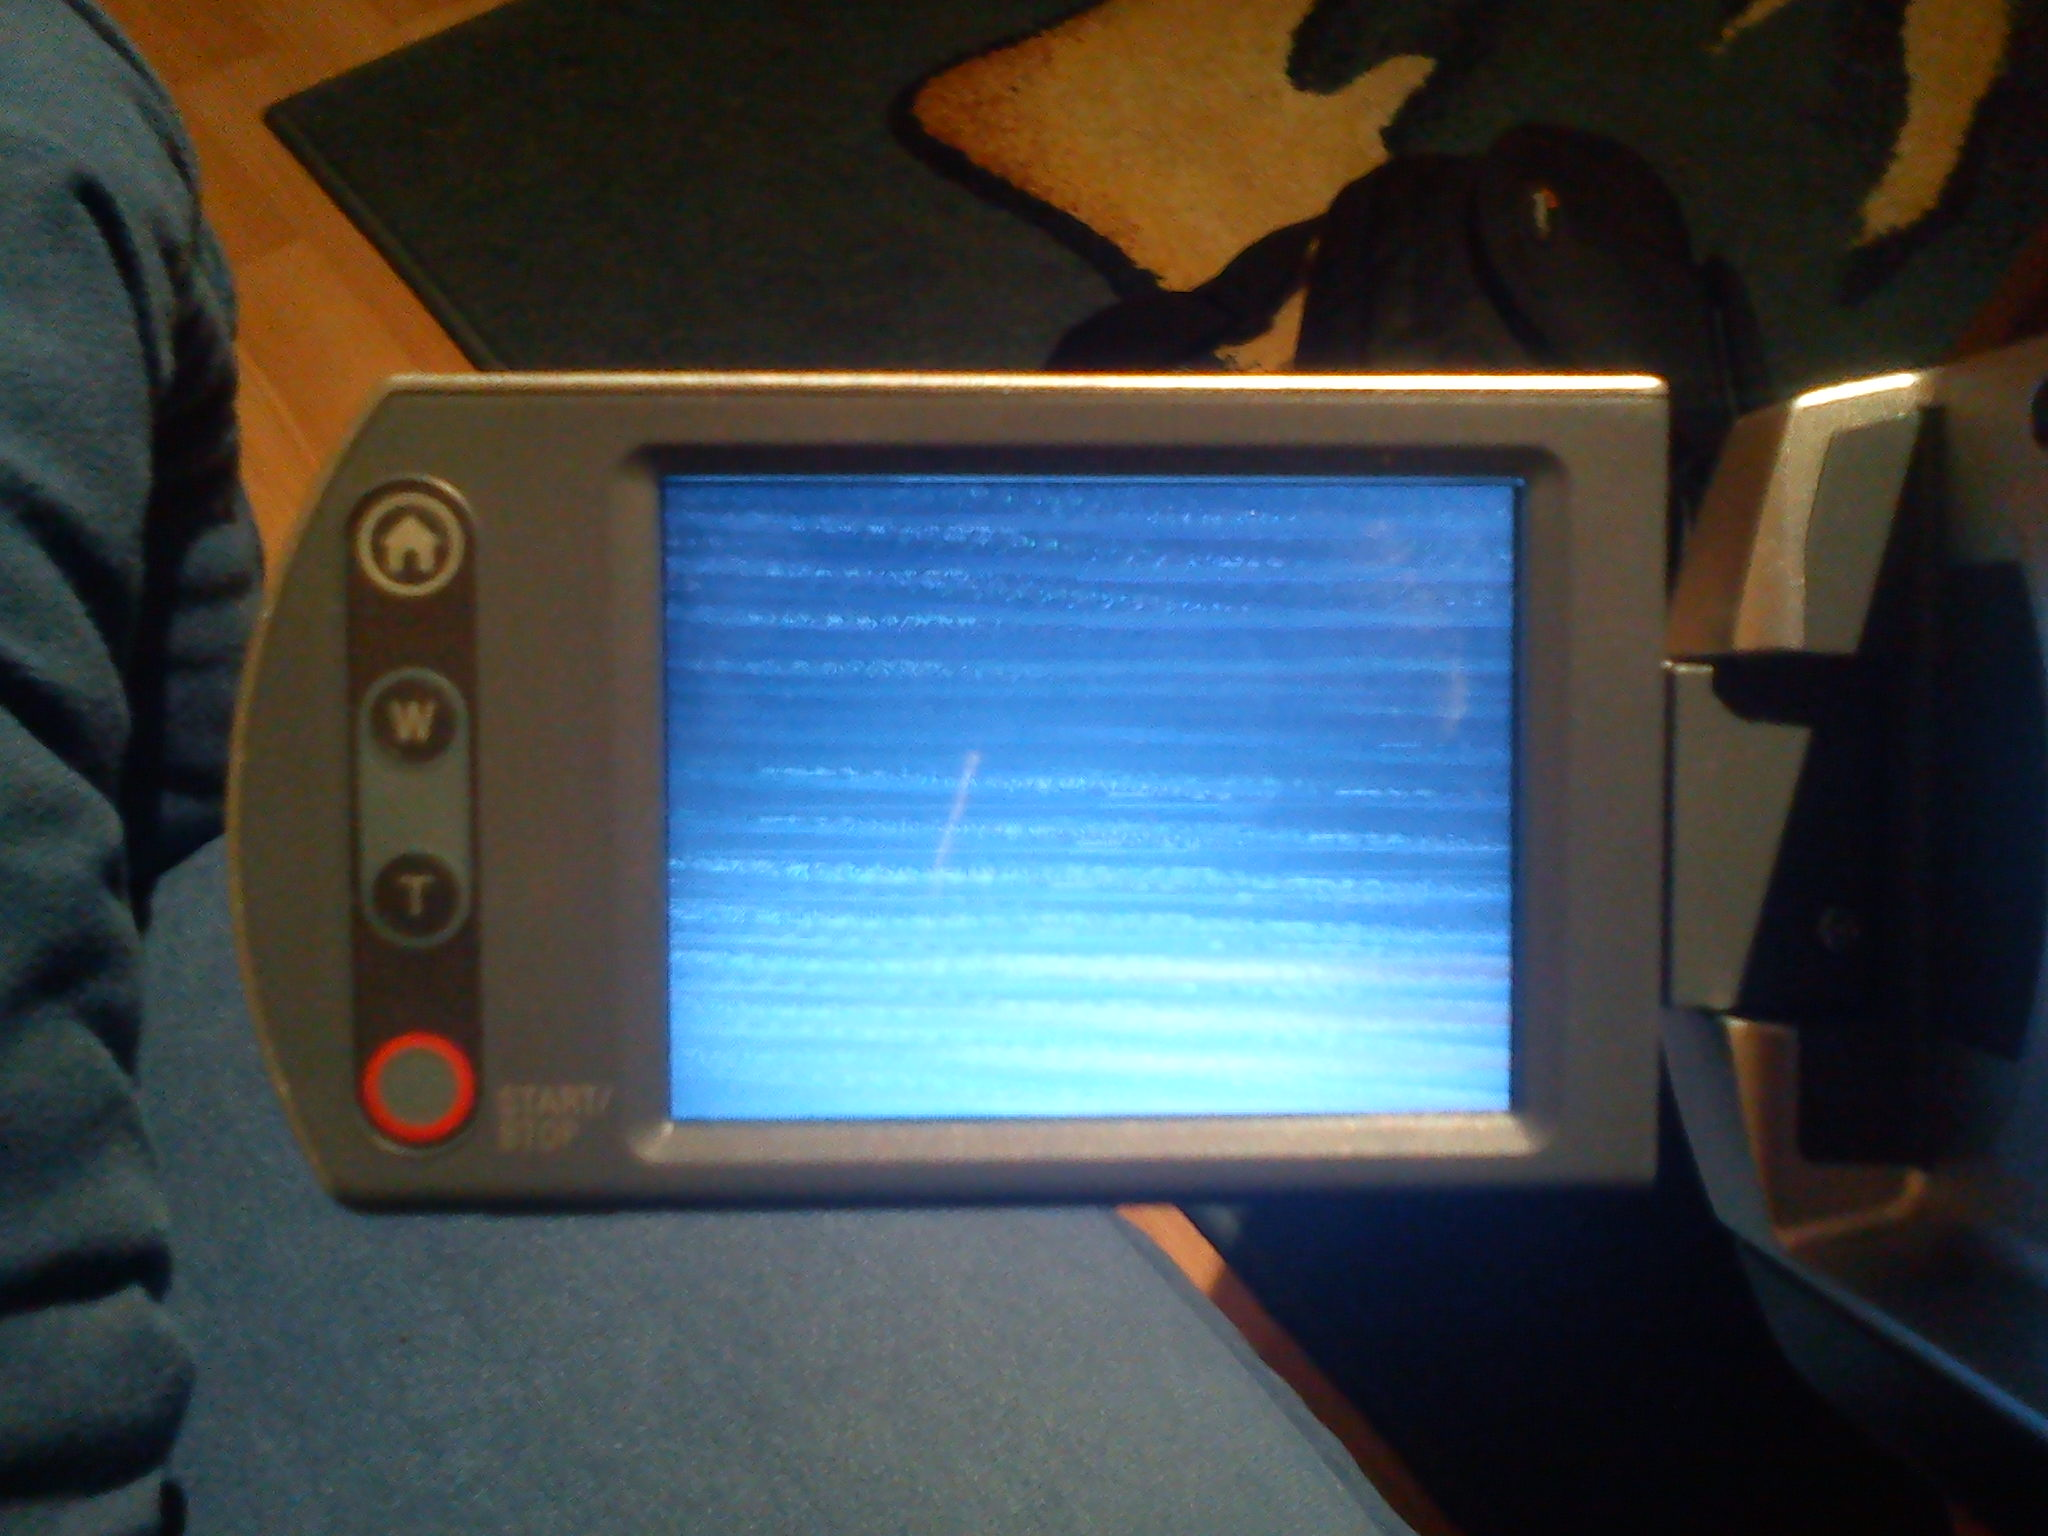 Sony dcr-sr33 - ekran (brak obrazu)